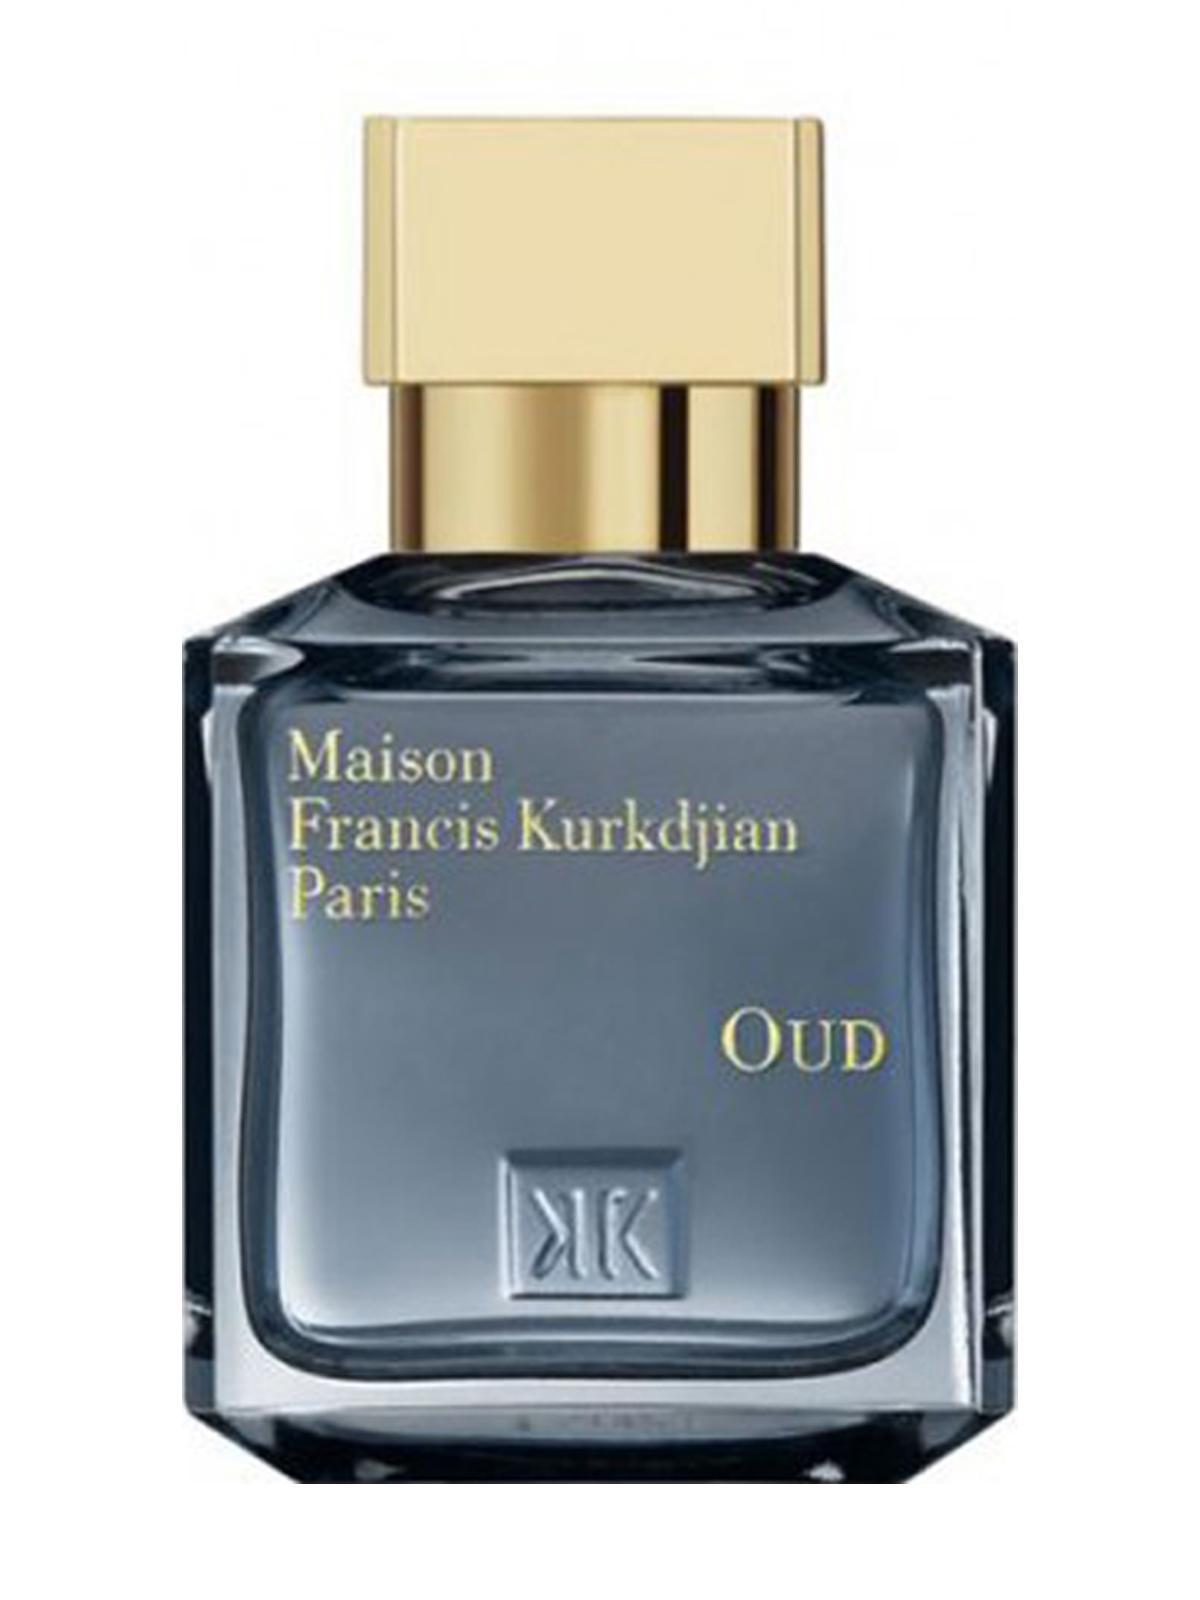 Francis Kurkdjian Oud For Unisex Eau De Parfum 70ML